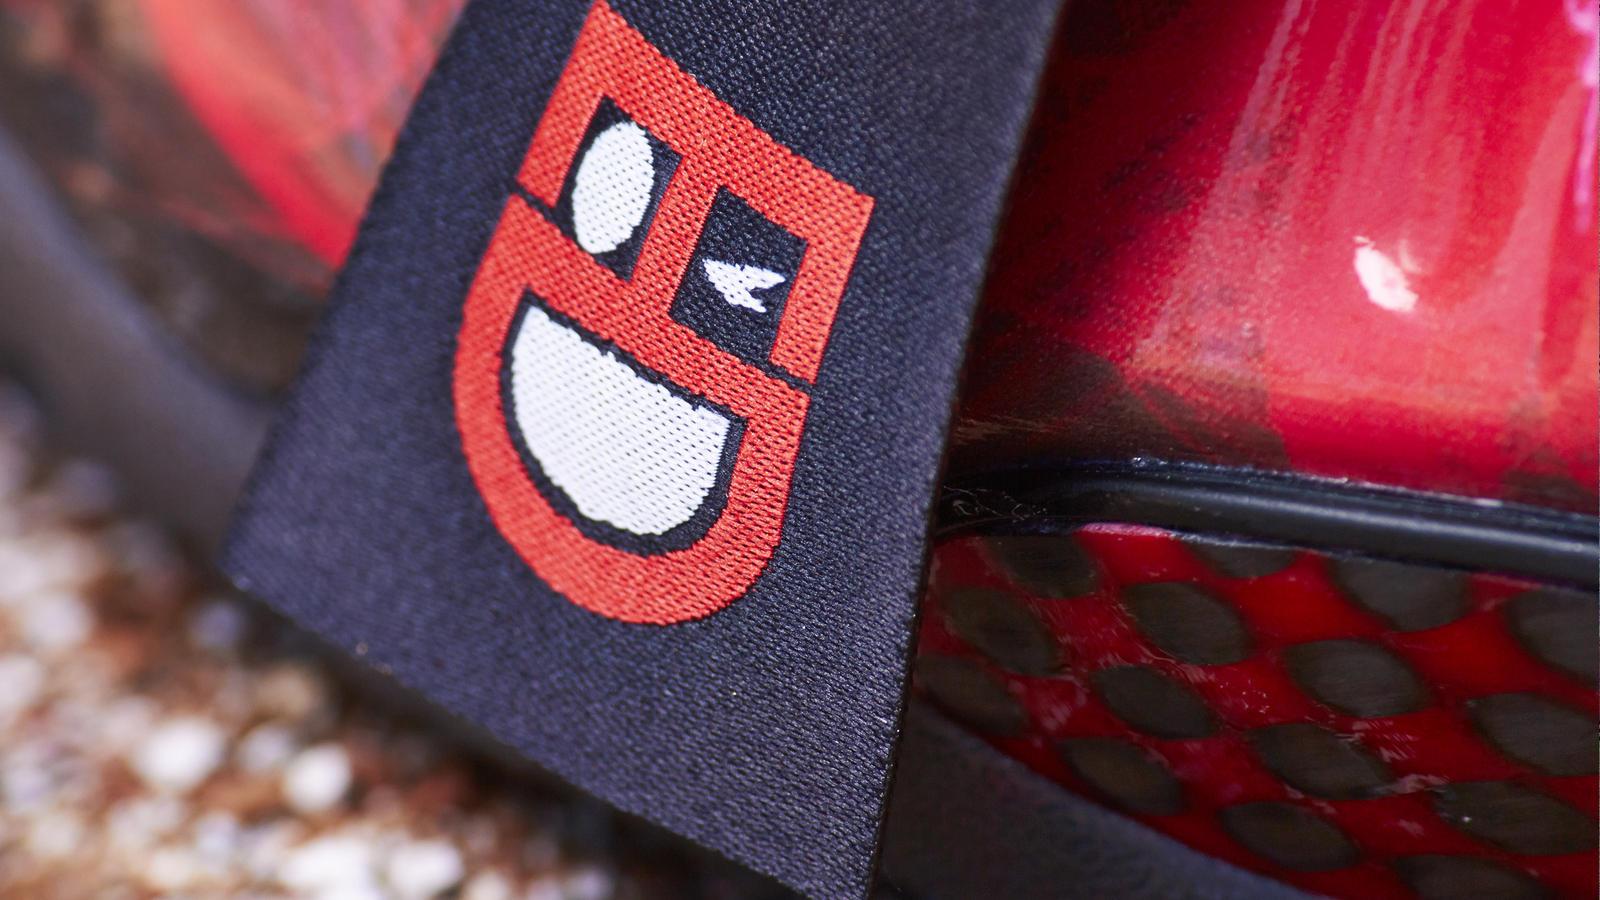 Footwear Detail V1 0029